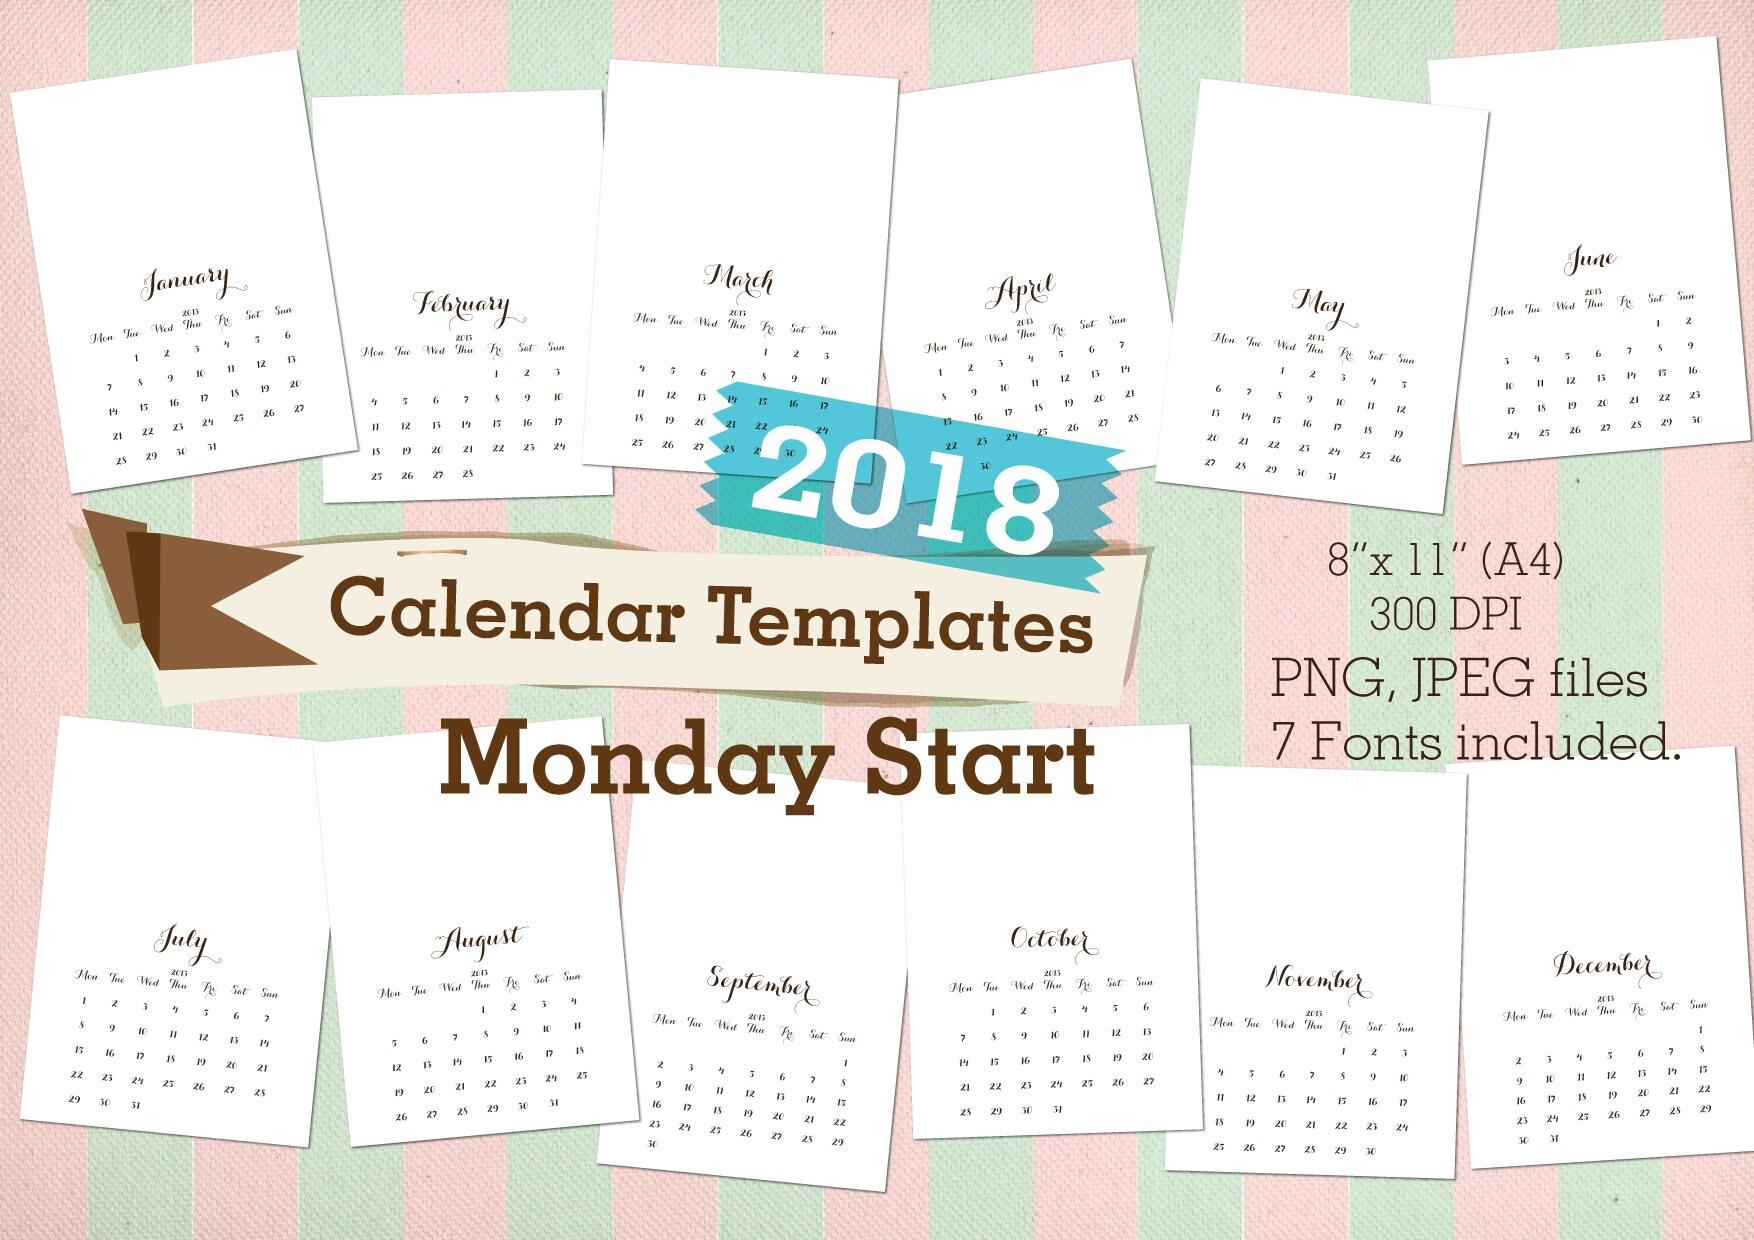 Monthly Calendar Monday Start : Calendars templates monday start commercial use